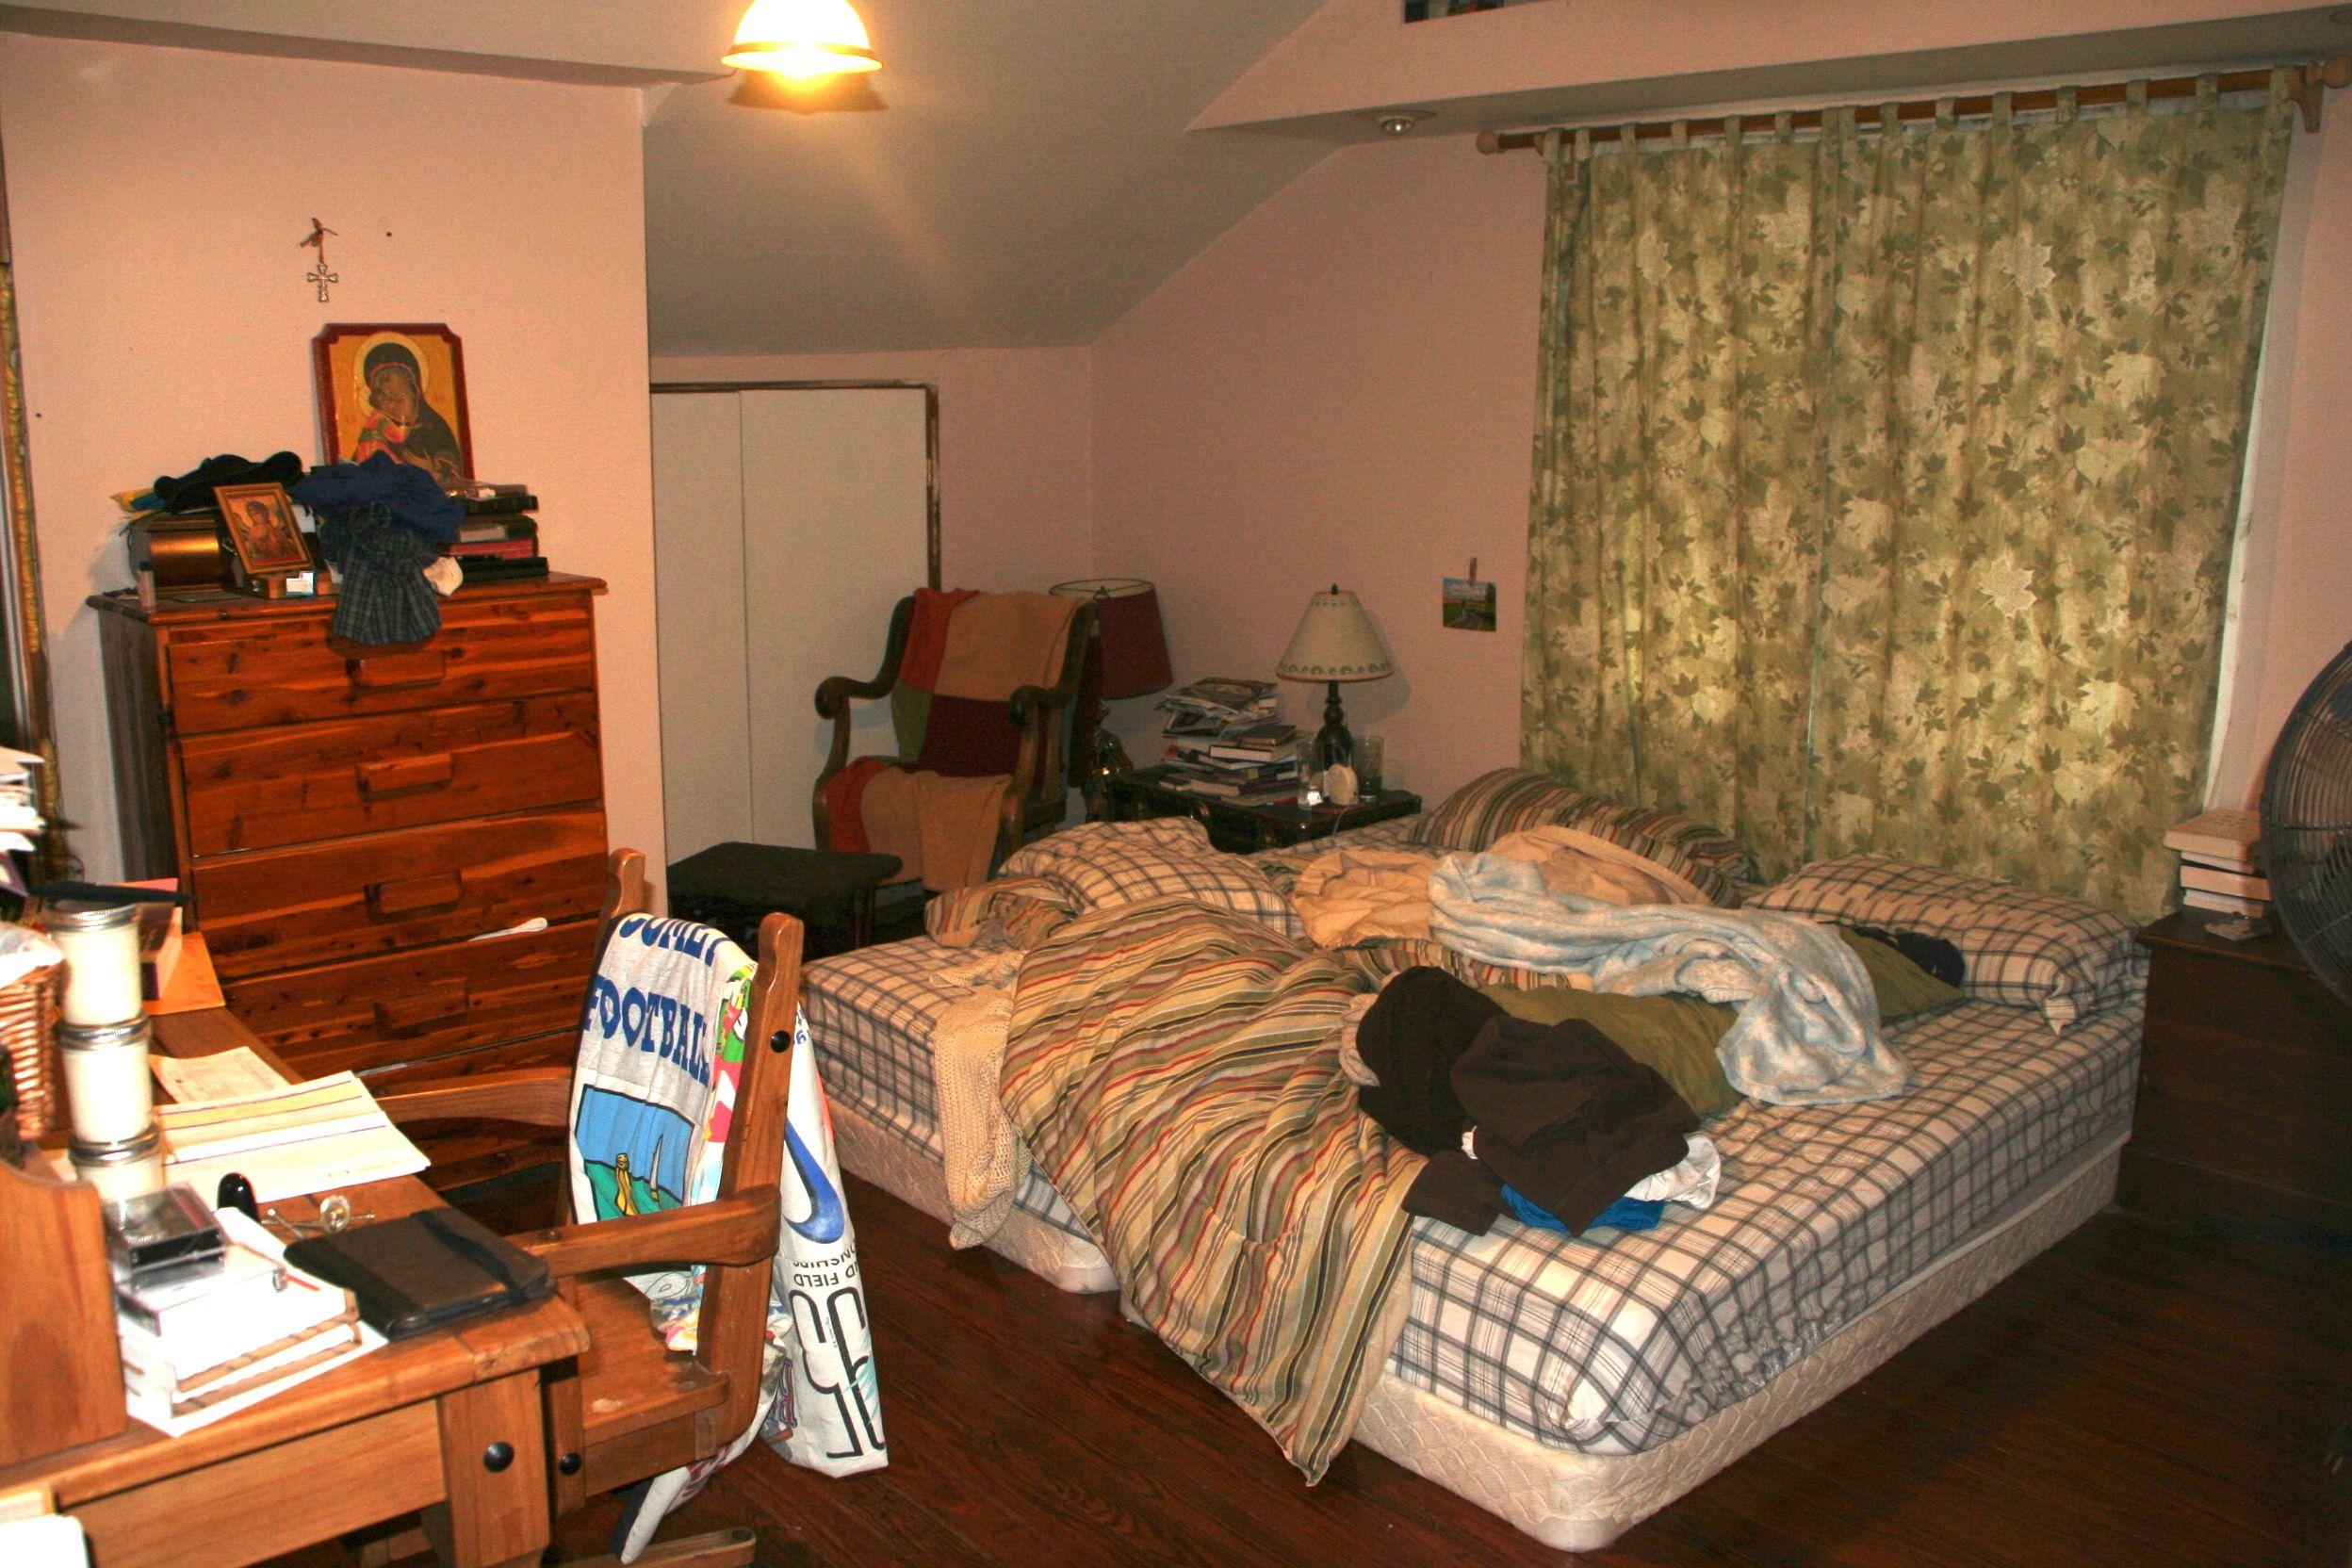 ugly bedroom   Google Search. ugly bedroom   Google Search   Complete Bedroom Set Ups